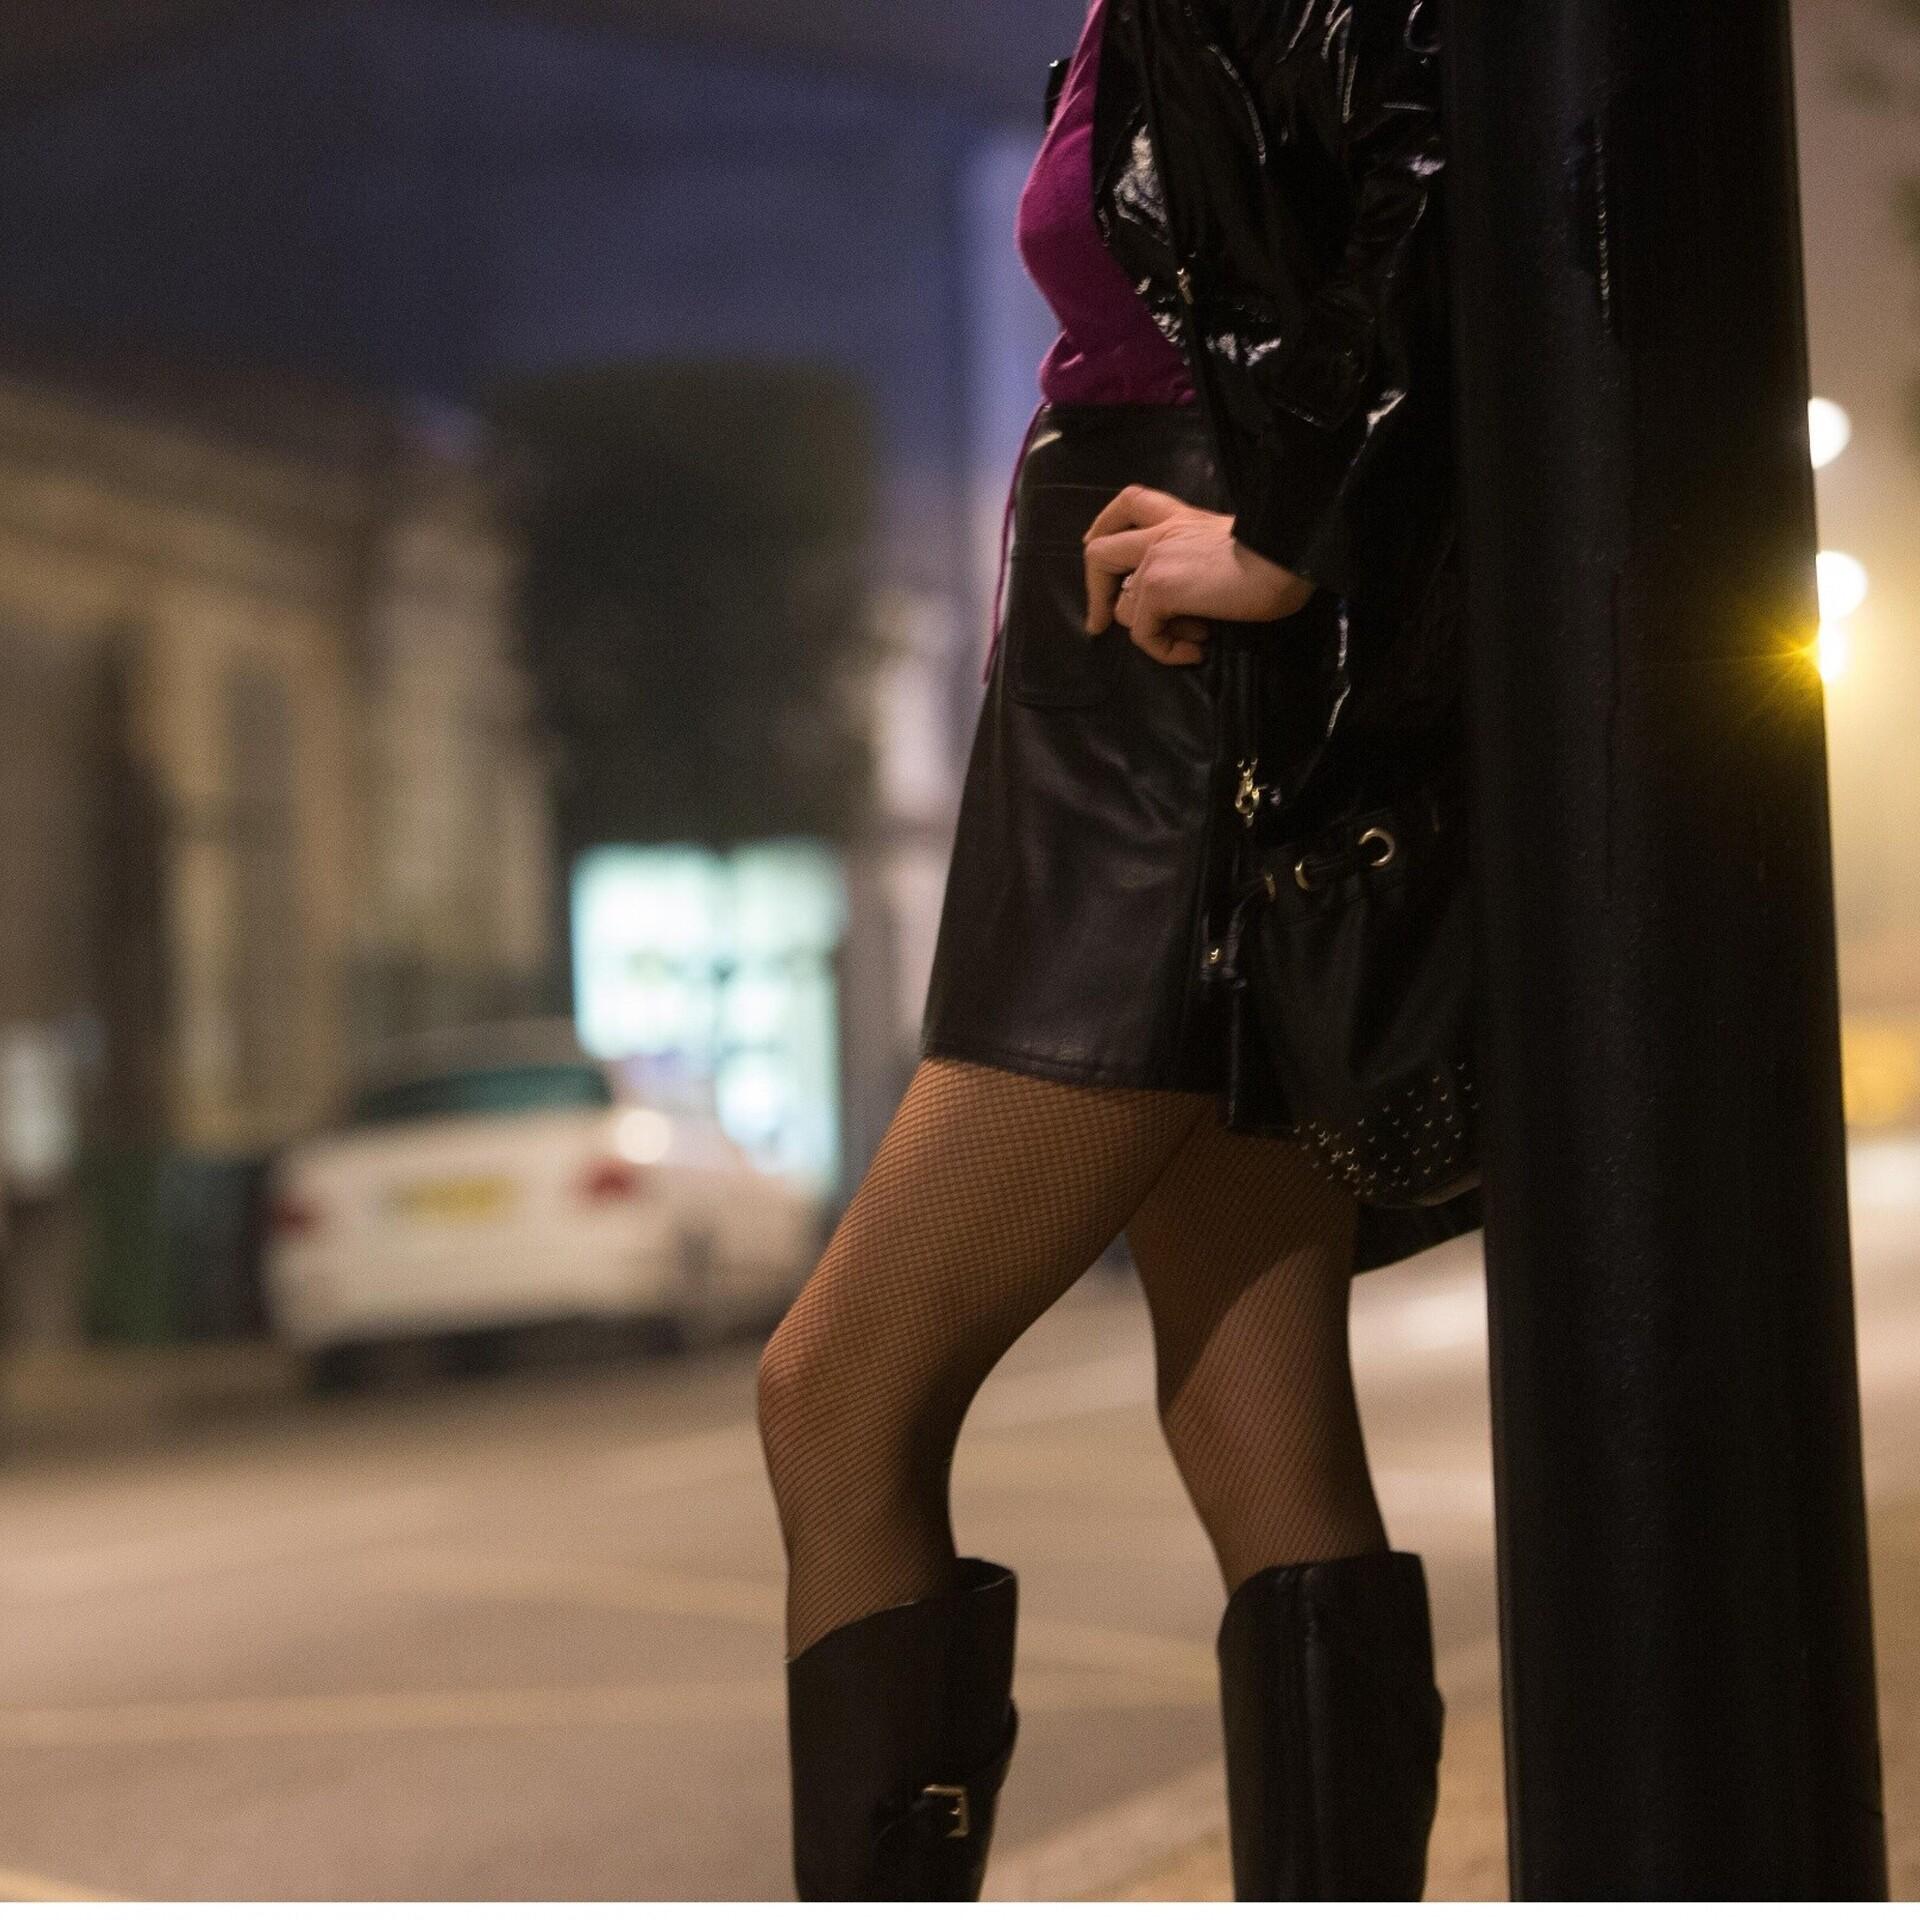 Пропогaндa проституткa